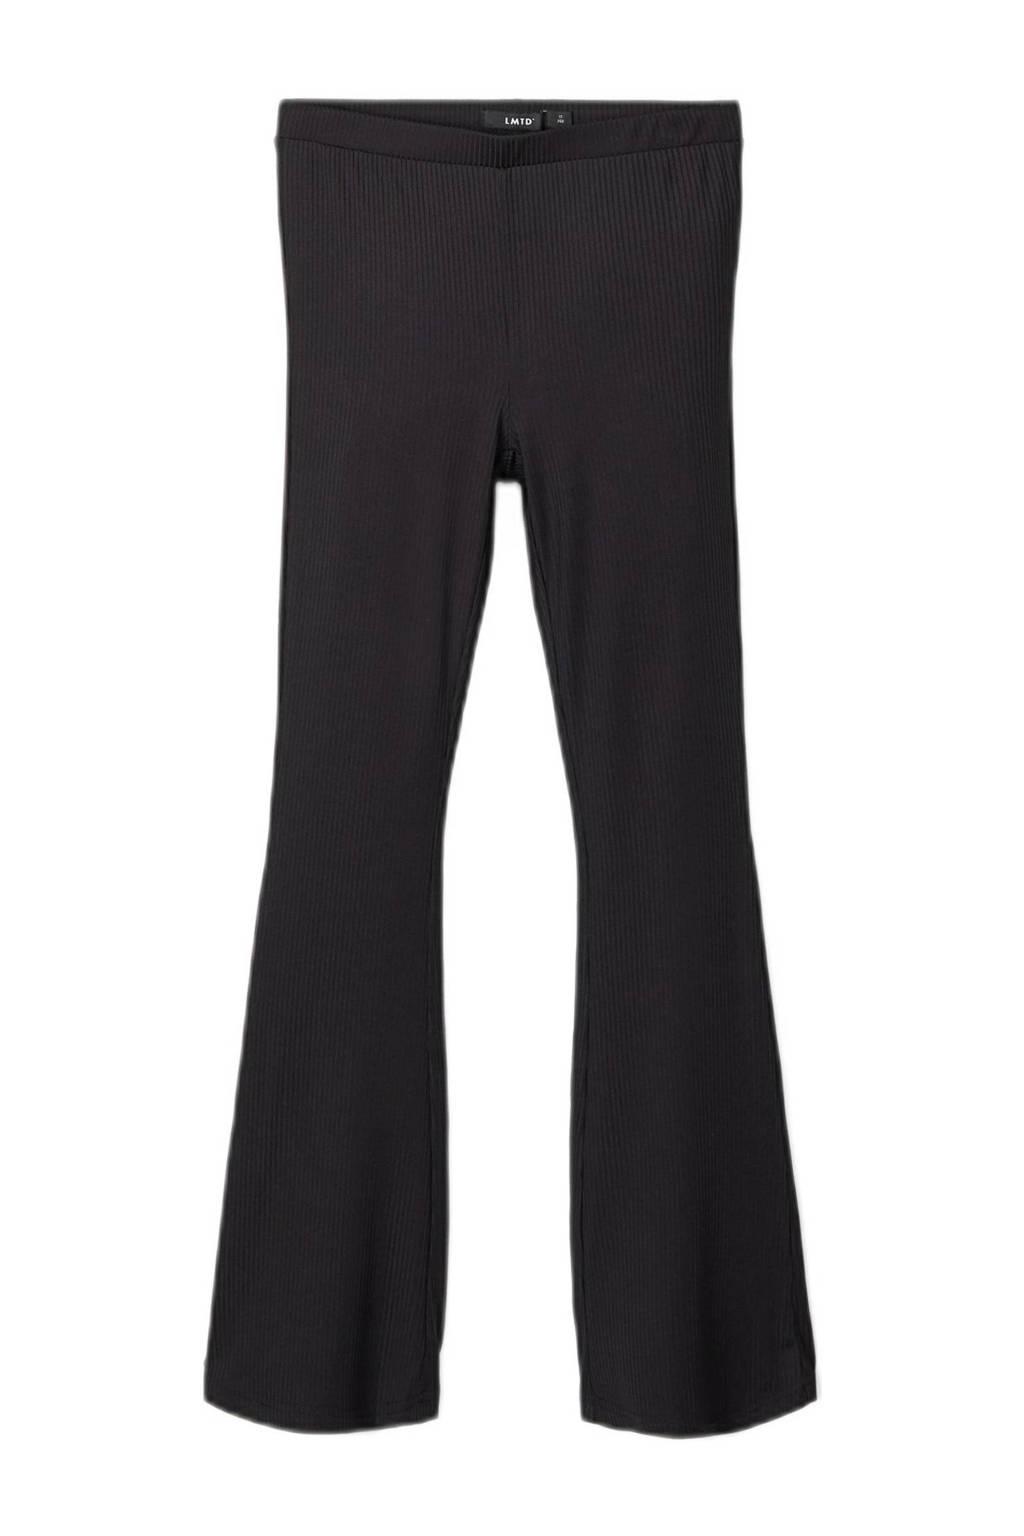 LMTD flared broek Dina zwart, Zwart